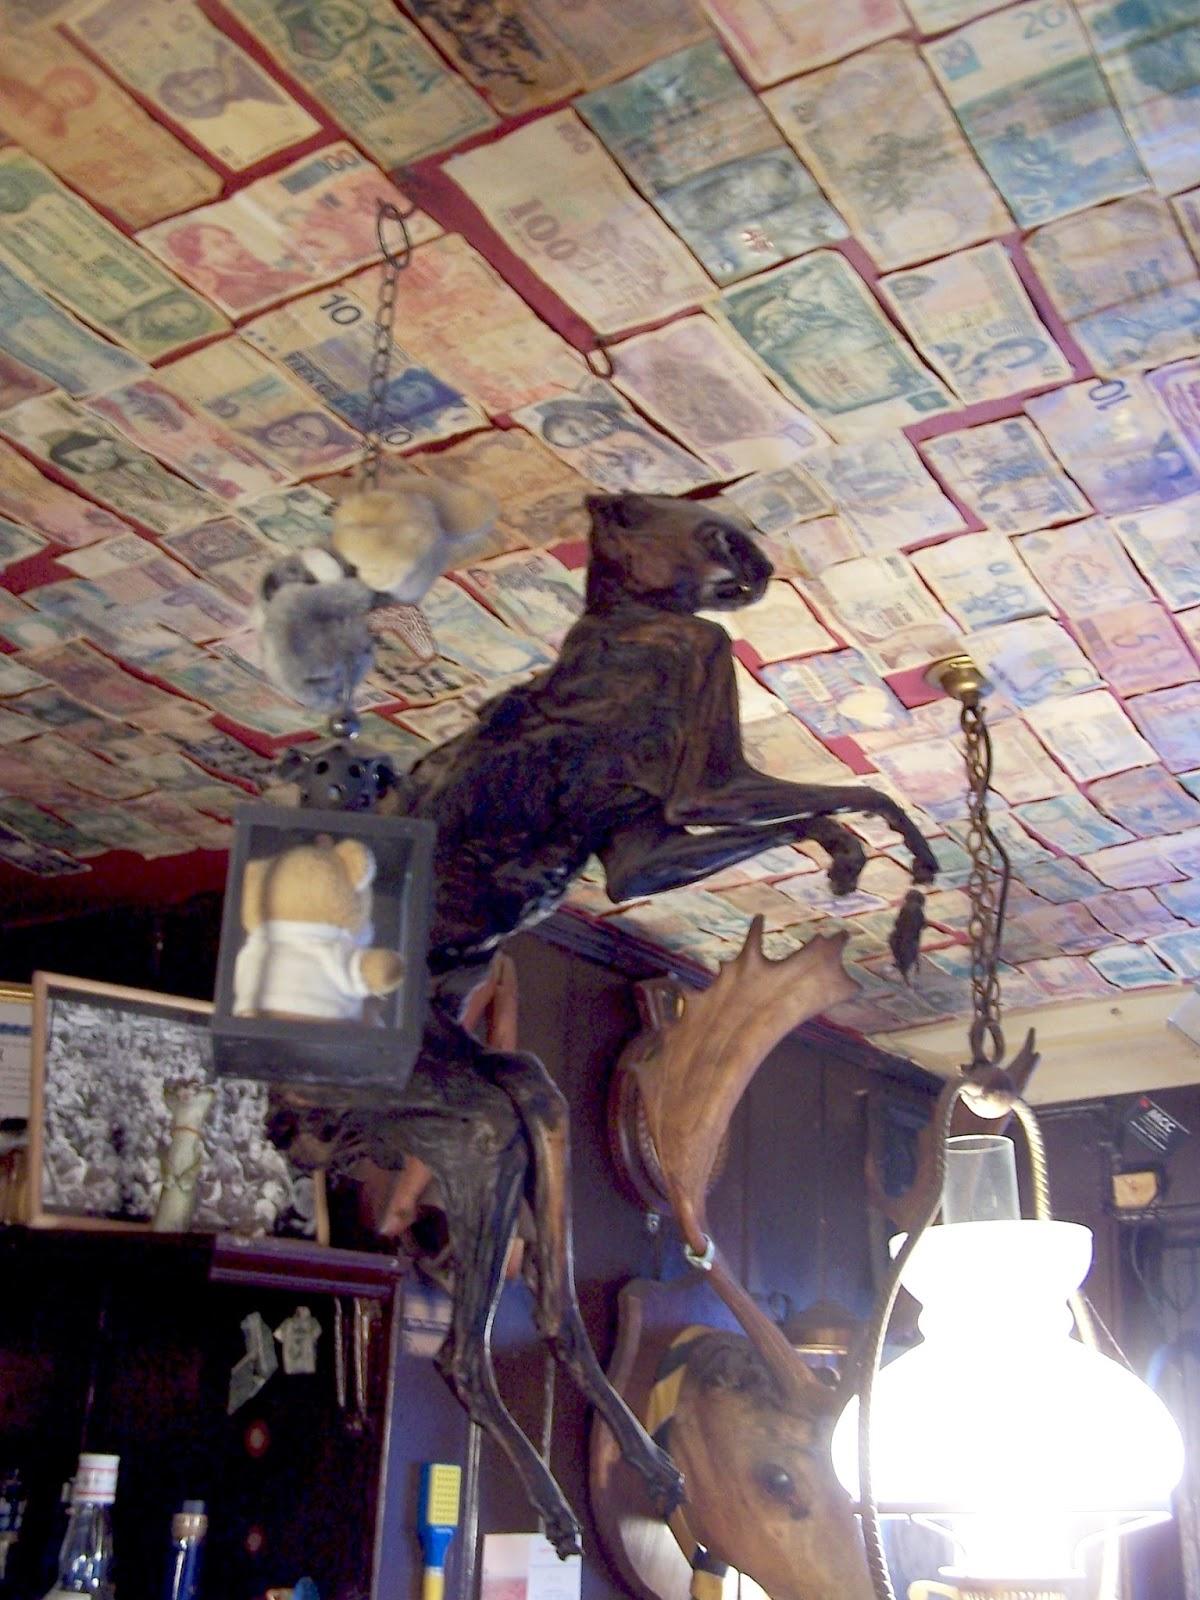 Matt Salusbury: West Suffolk mummified cat safari